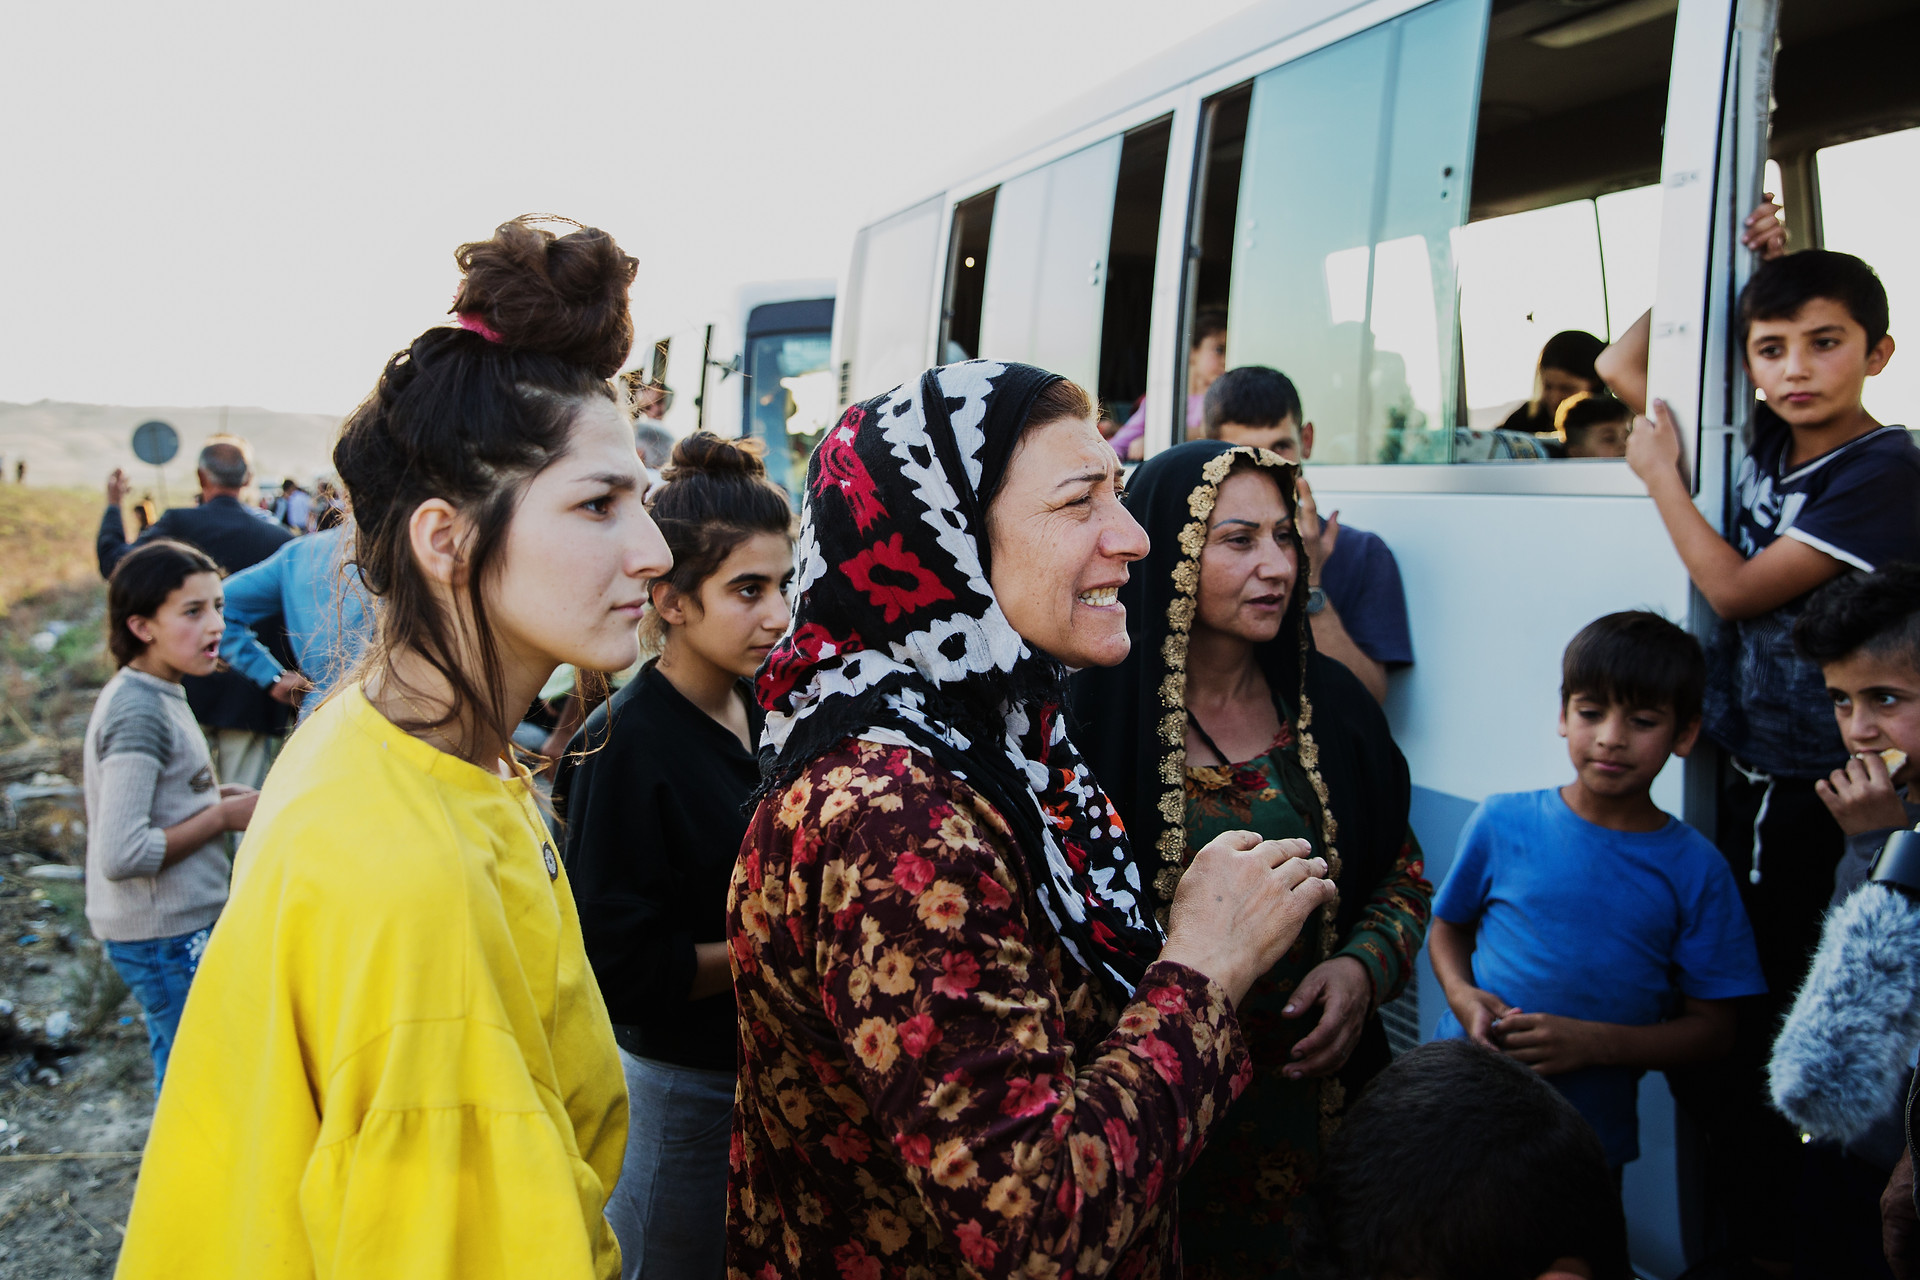 HL_LPERPIGNAIBAN_REFUGEES_FLEE_SYRIA_7-2